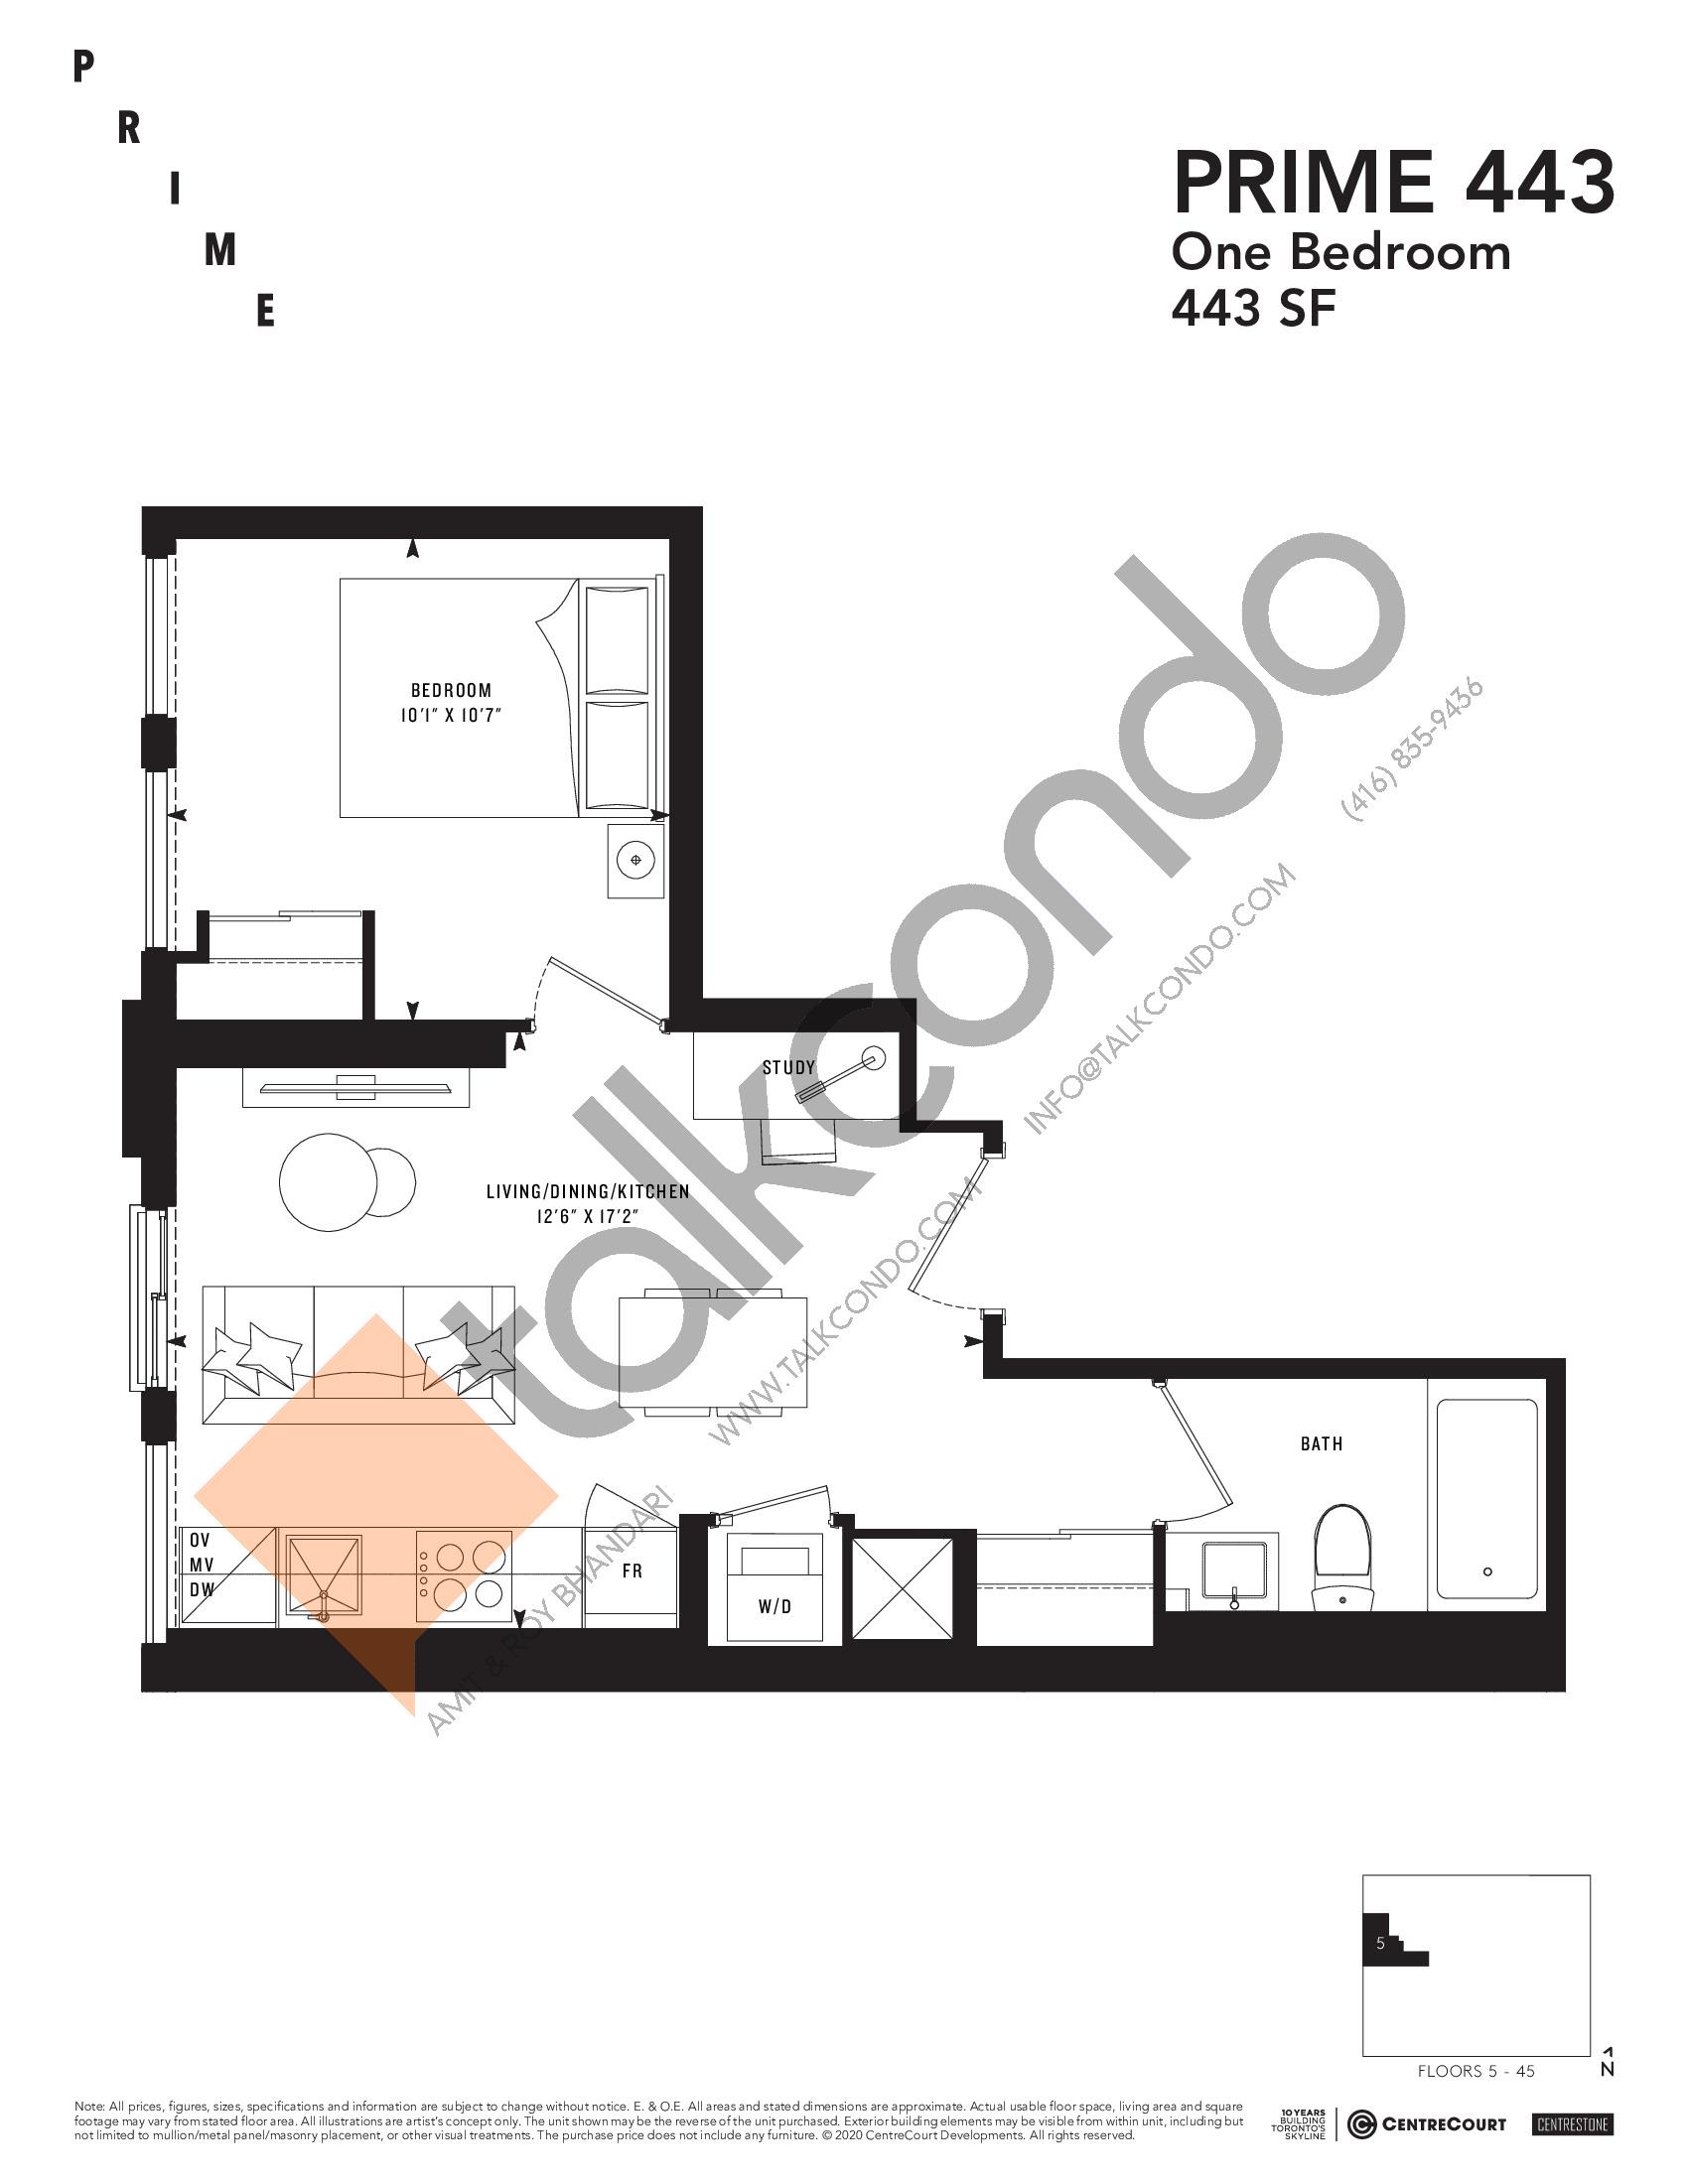 PRIME 443 Floor Plan at Prime Condos - 443 sq.ft